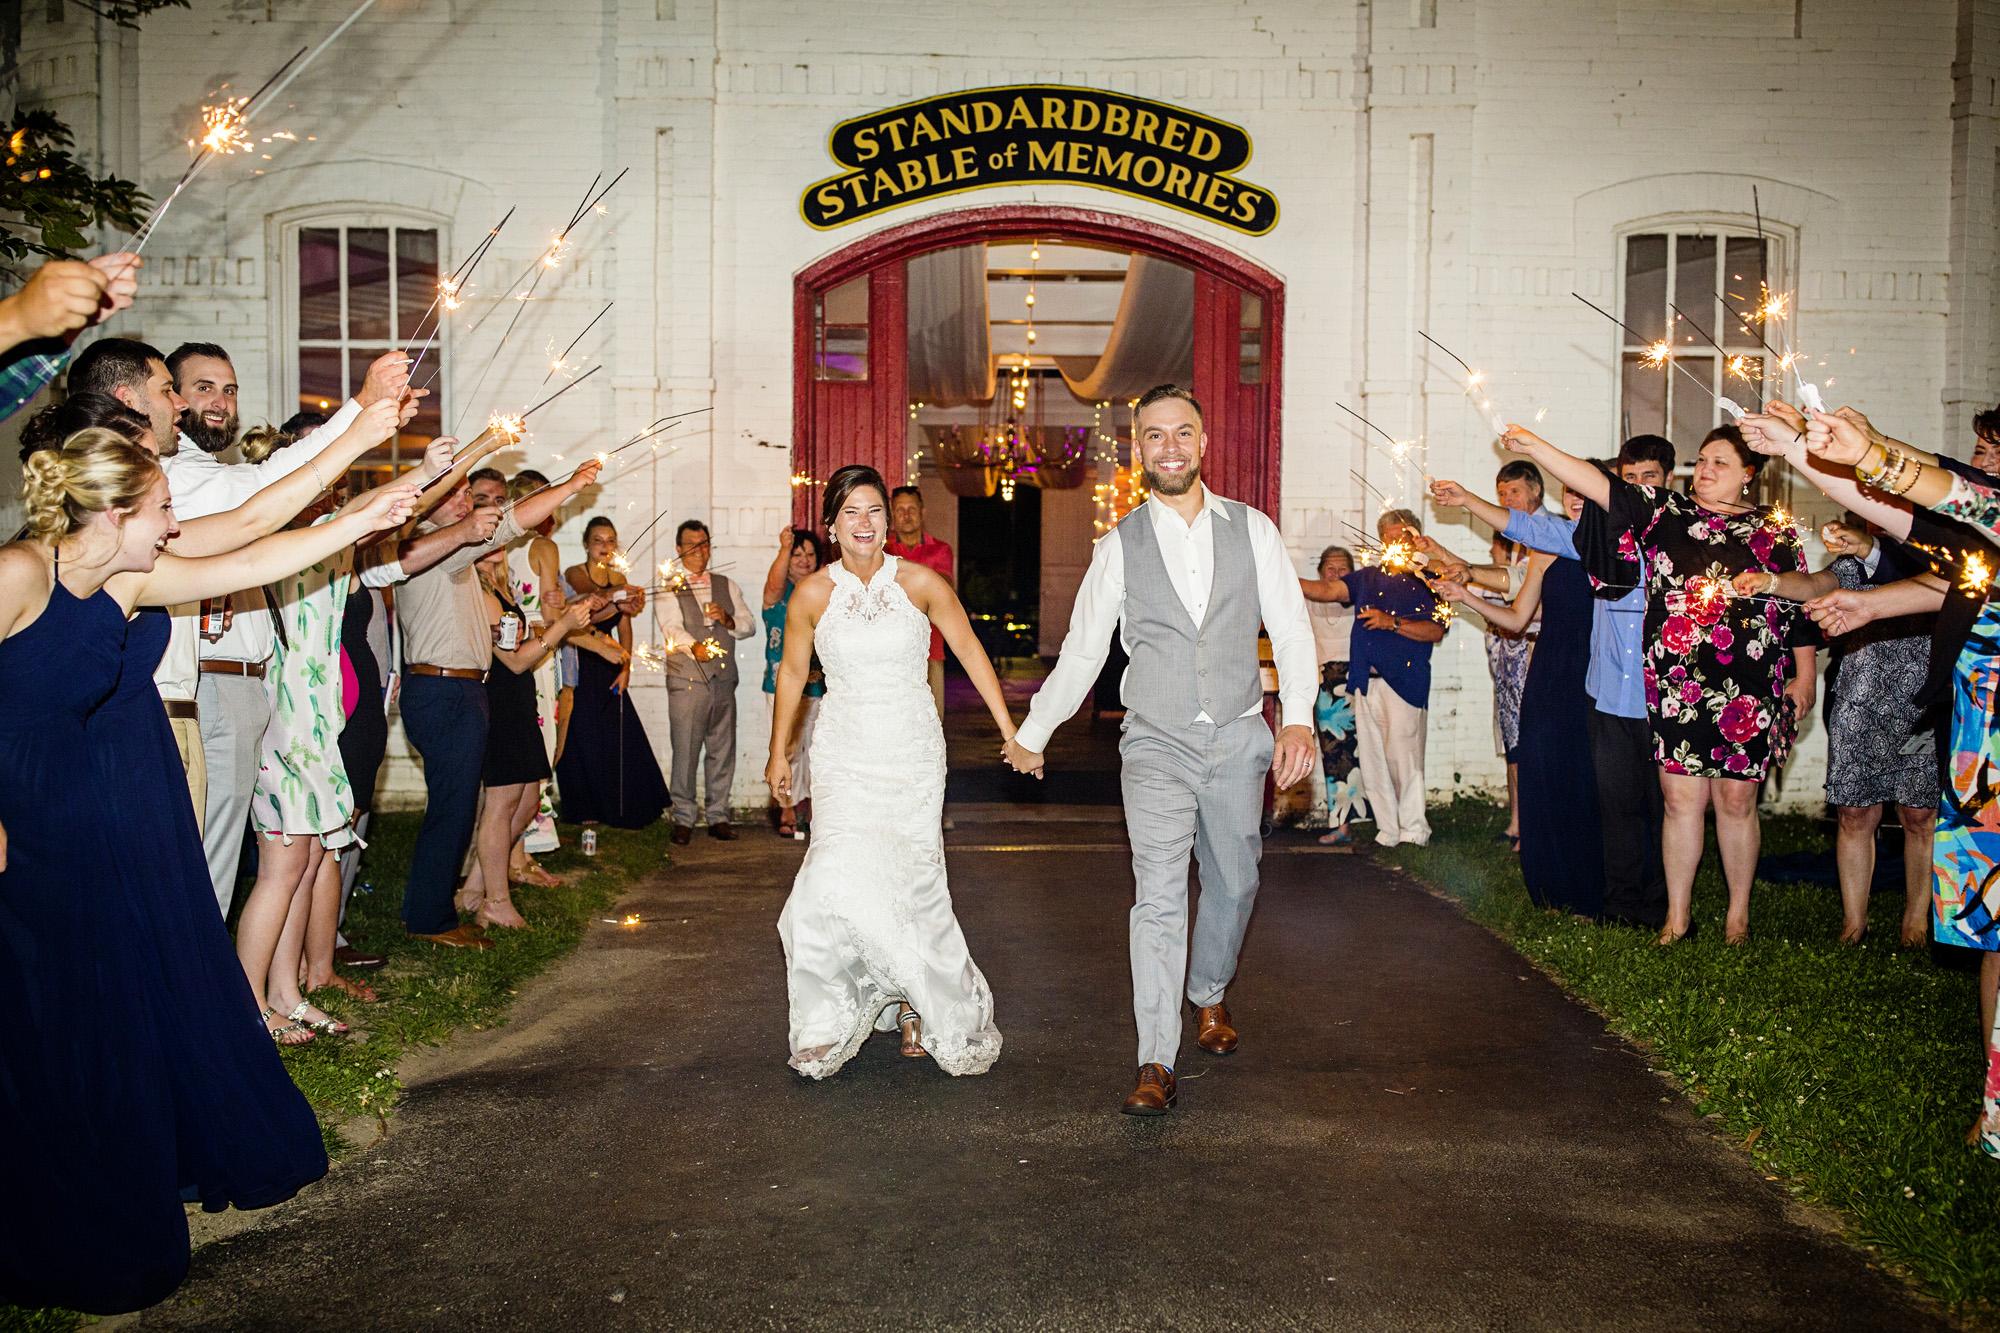 Seriously_Sabrina_Photography_Lexington_Kentucky_Round_Barn_Red_Mile_Stable_of_Memories_Wedding_Hart_141.jpg